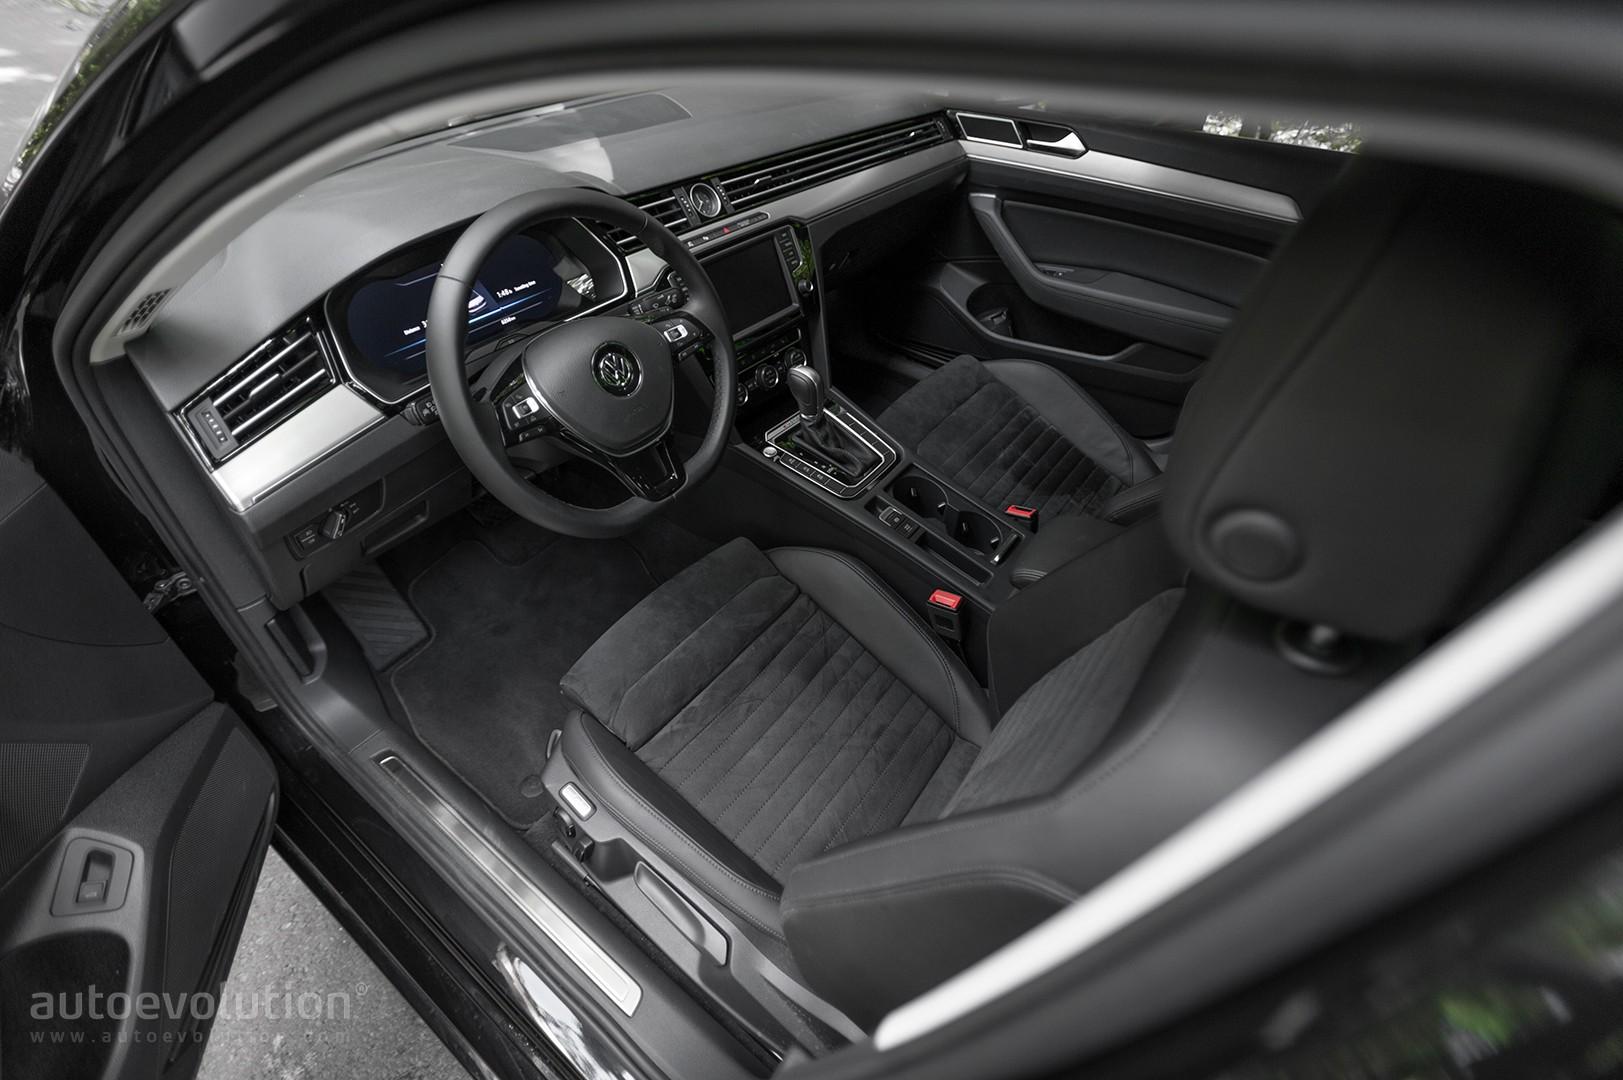 VW vw passat 2001 : 2016 Volkswagen Passat 2.0 BiTDI 4Motion Review - autoevolution